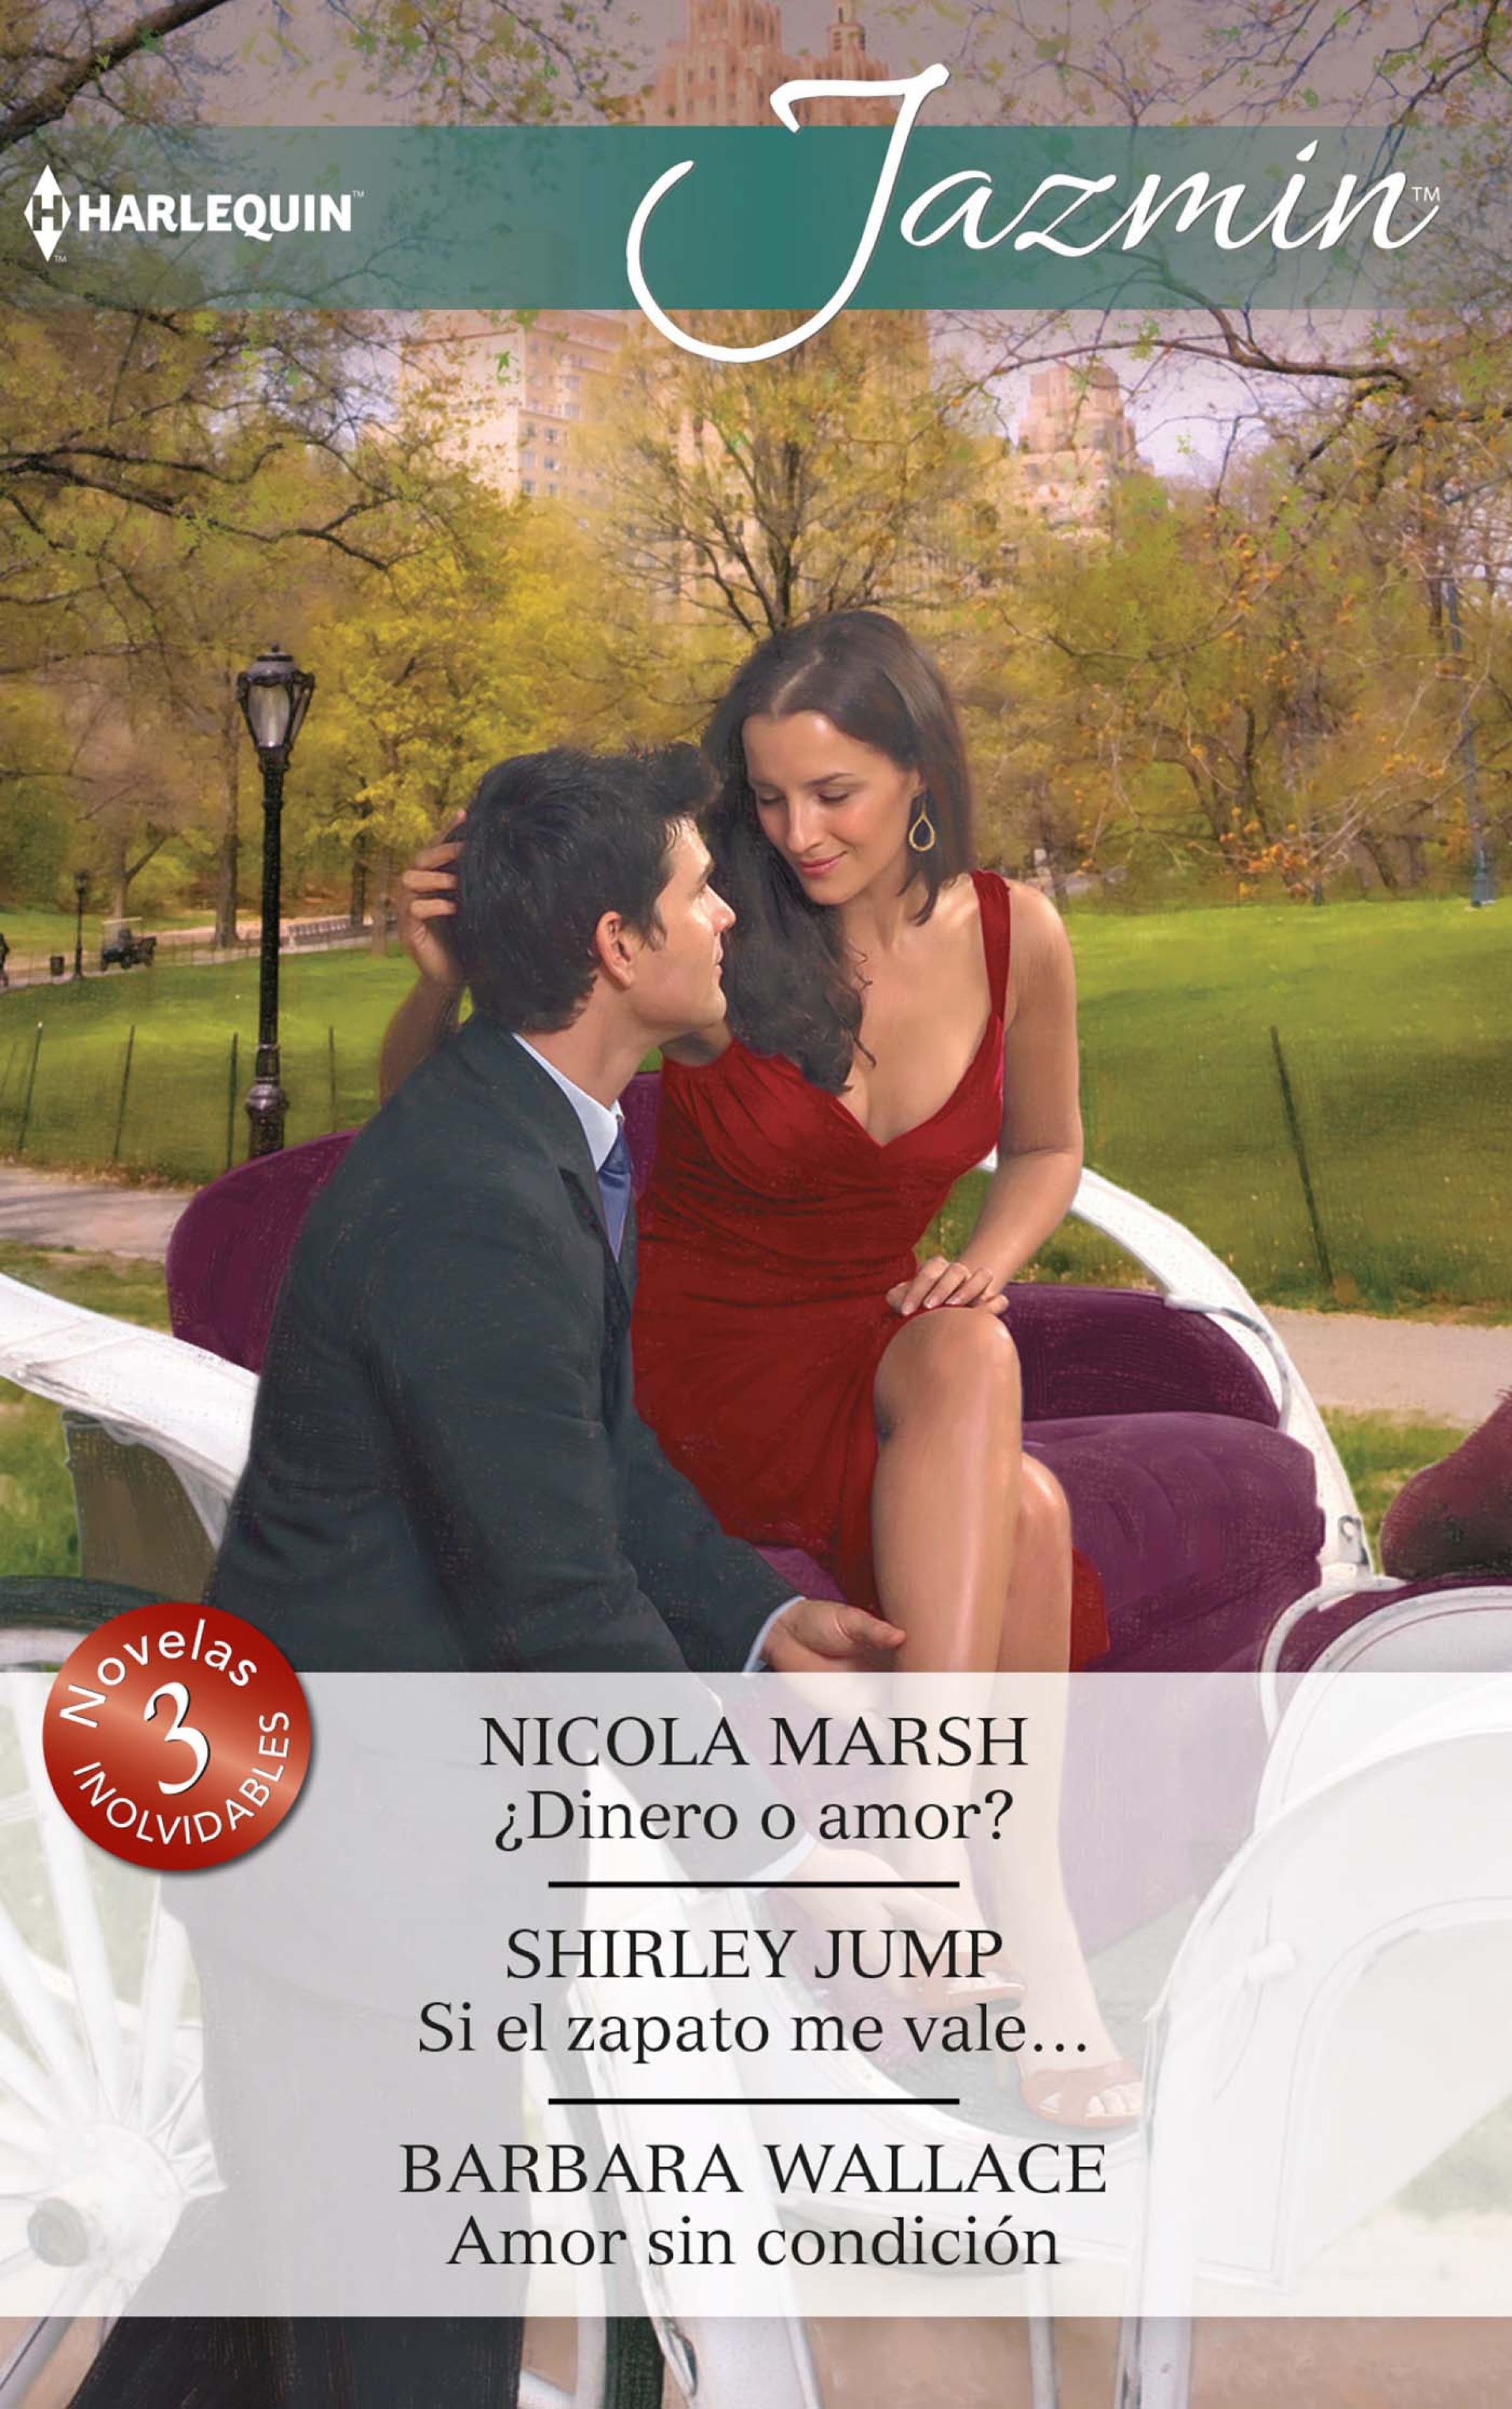 Nicola Marsh ¿Dinero o amor? - Si el zapato me vale… - Amor sin condición joanna neil oferece me o teu amor